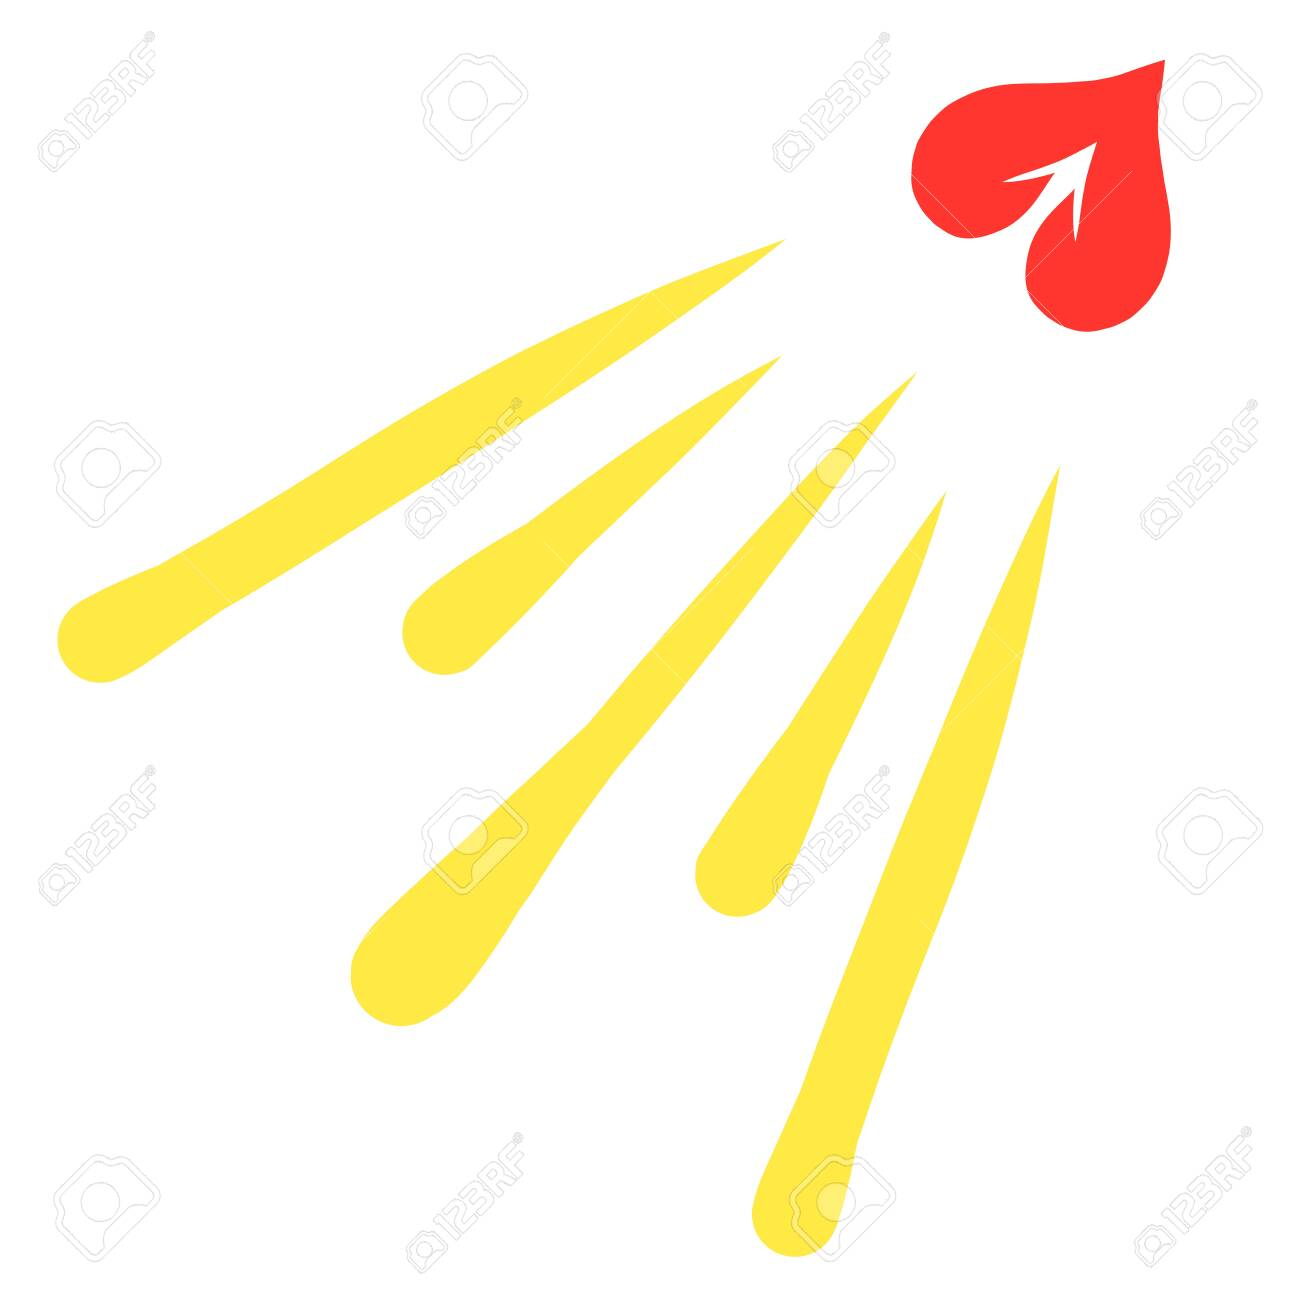 a soaring heart with an arrow, like a shining sun - 133305241